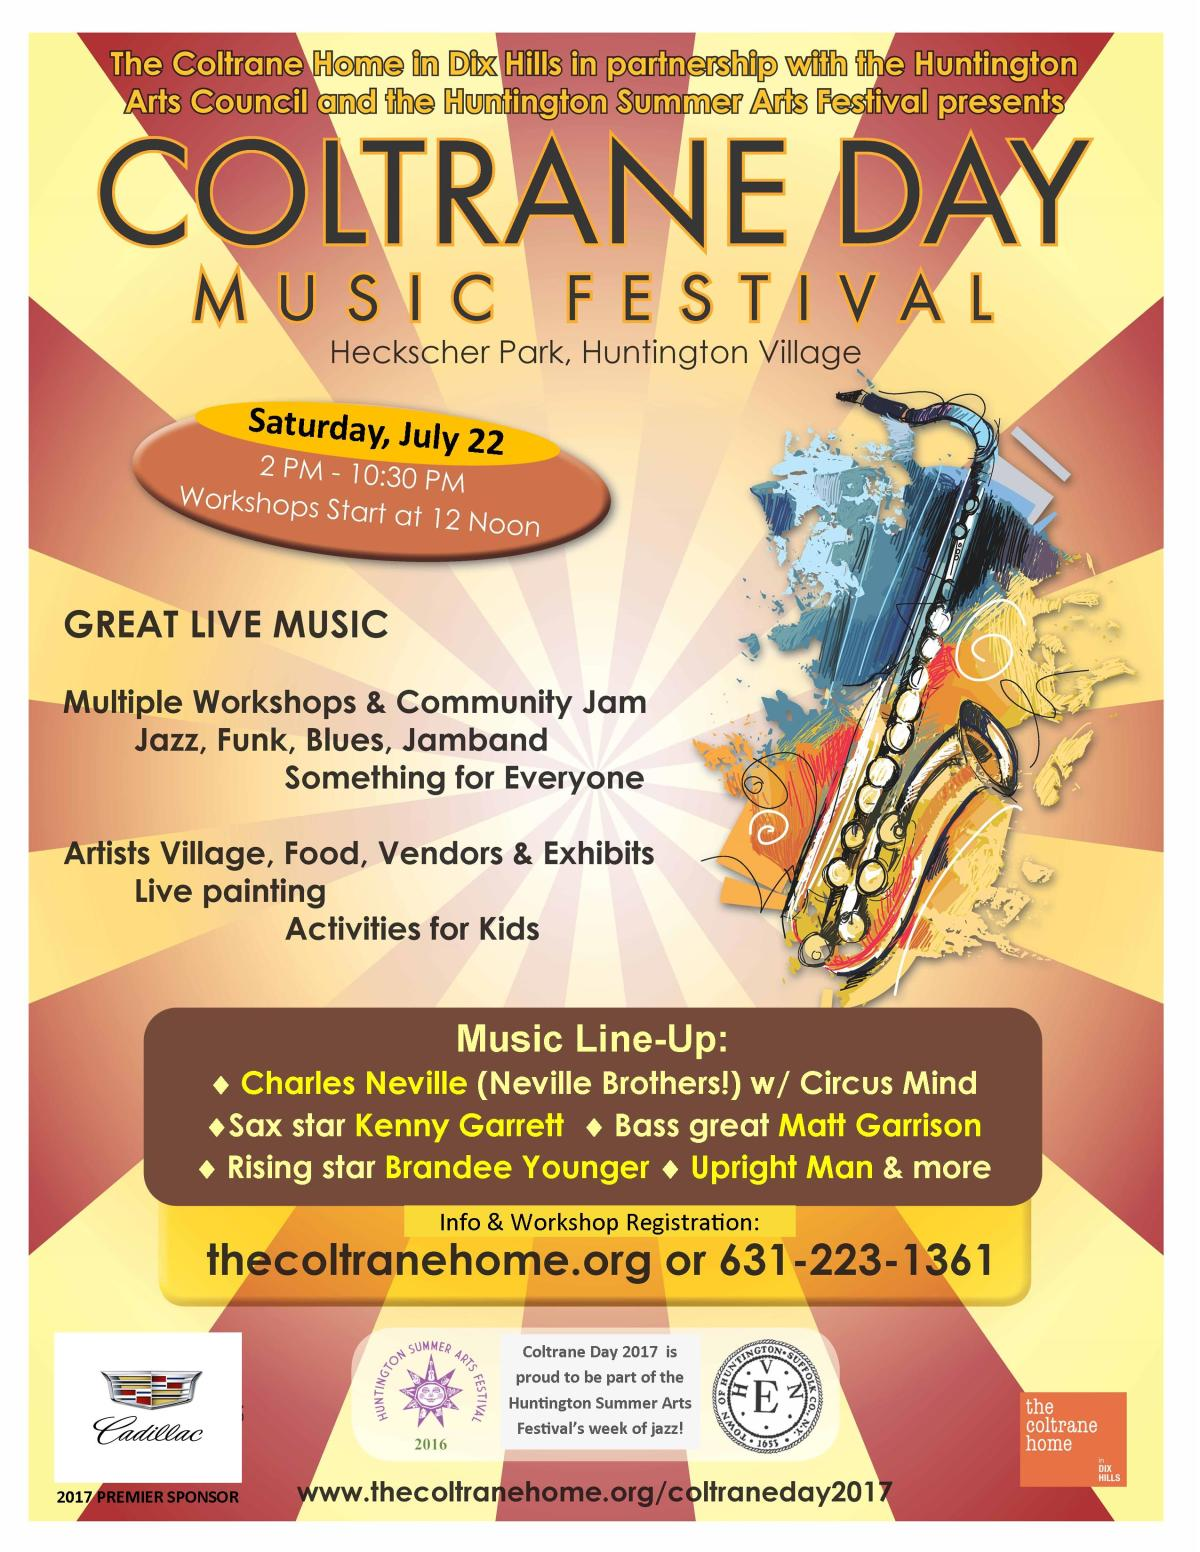 Coltrane Day